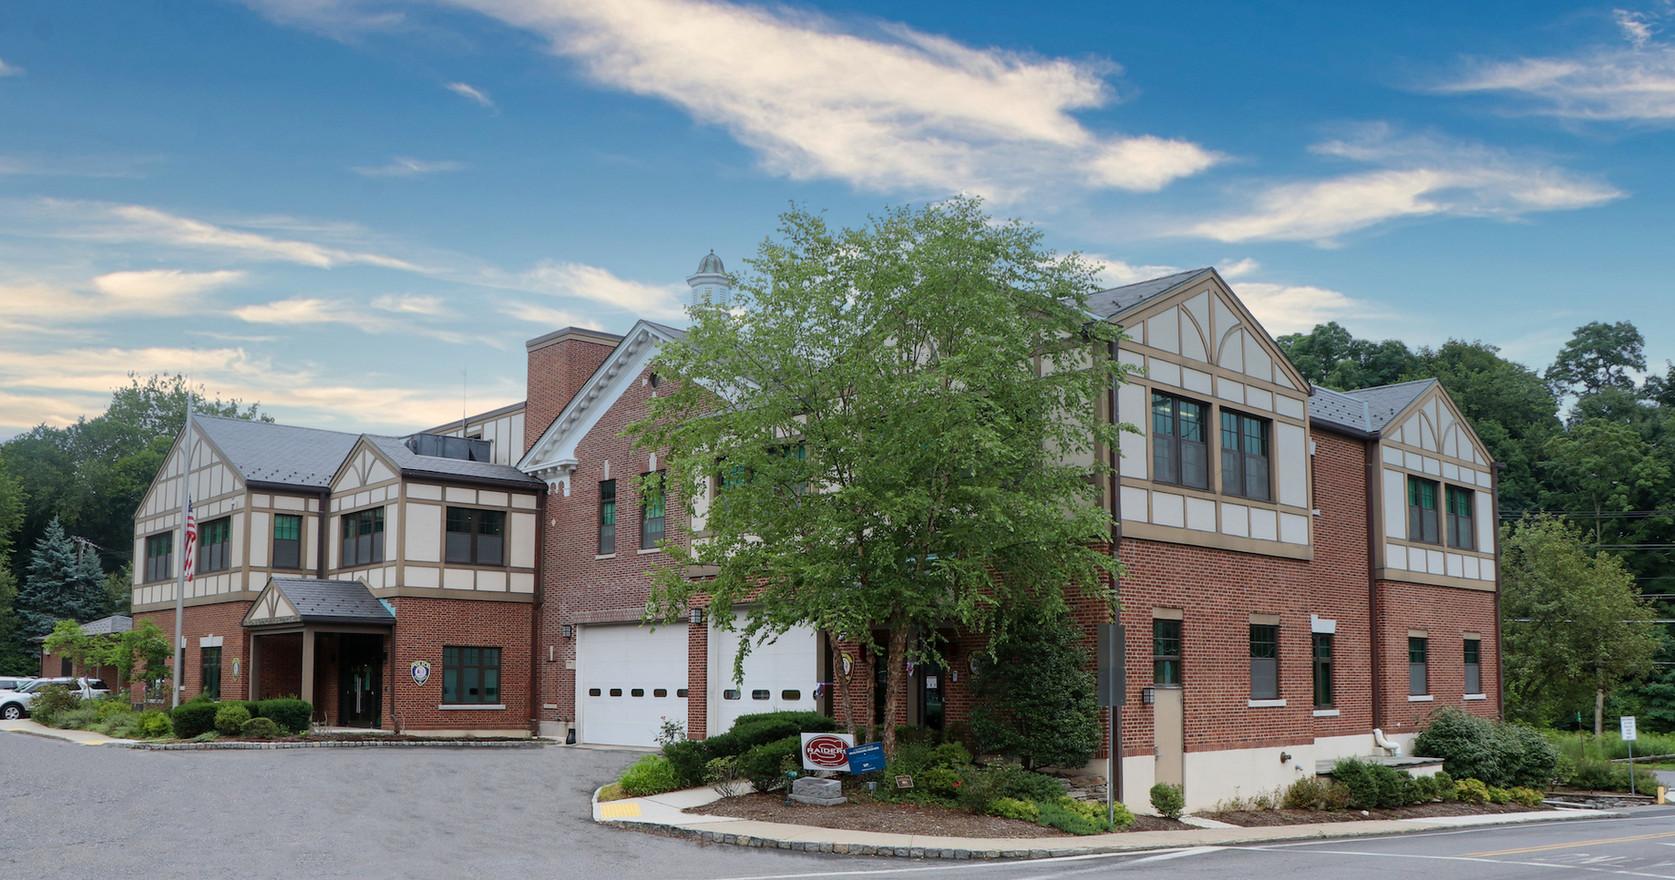 Scarsdale Public Safety Building